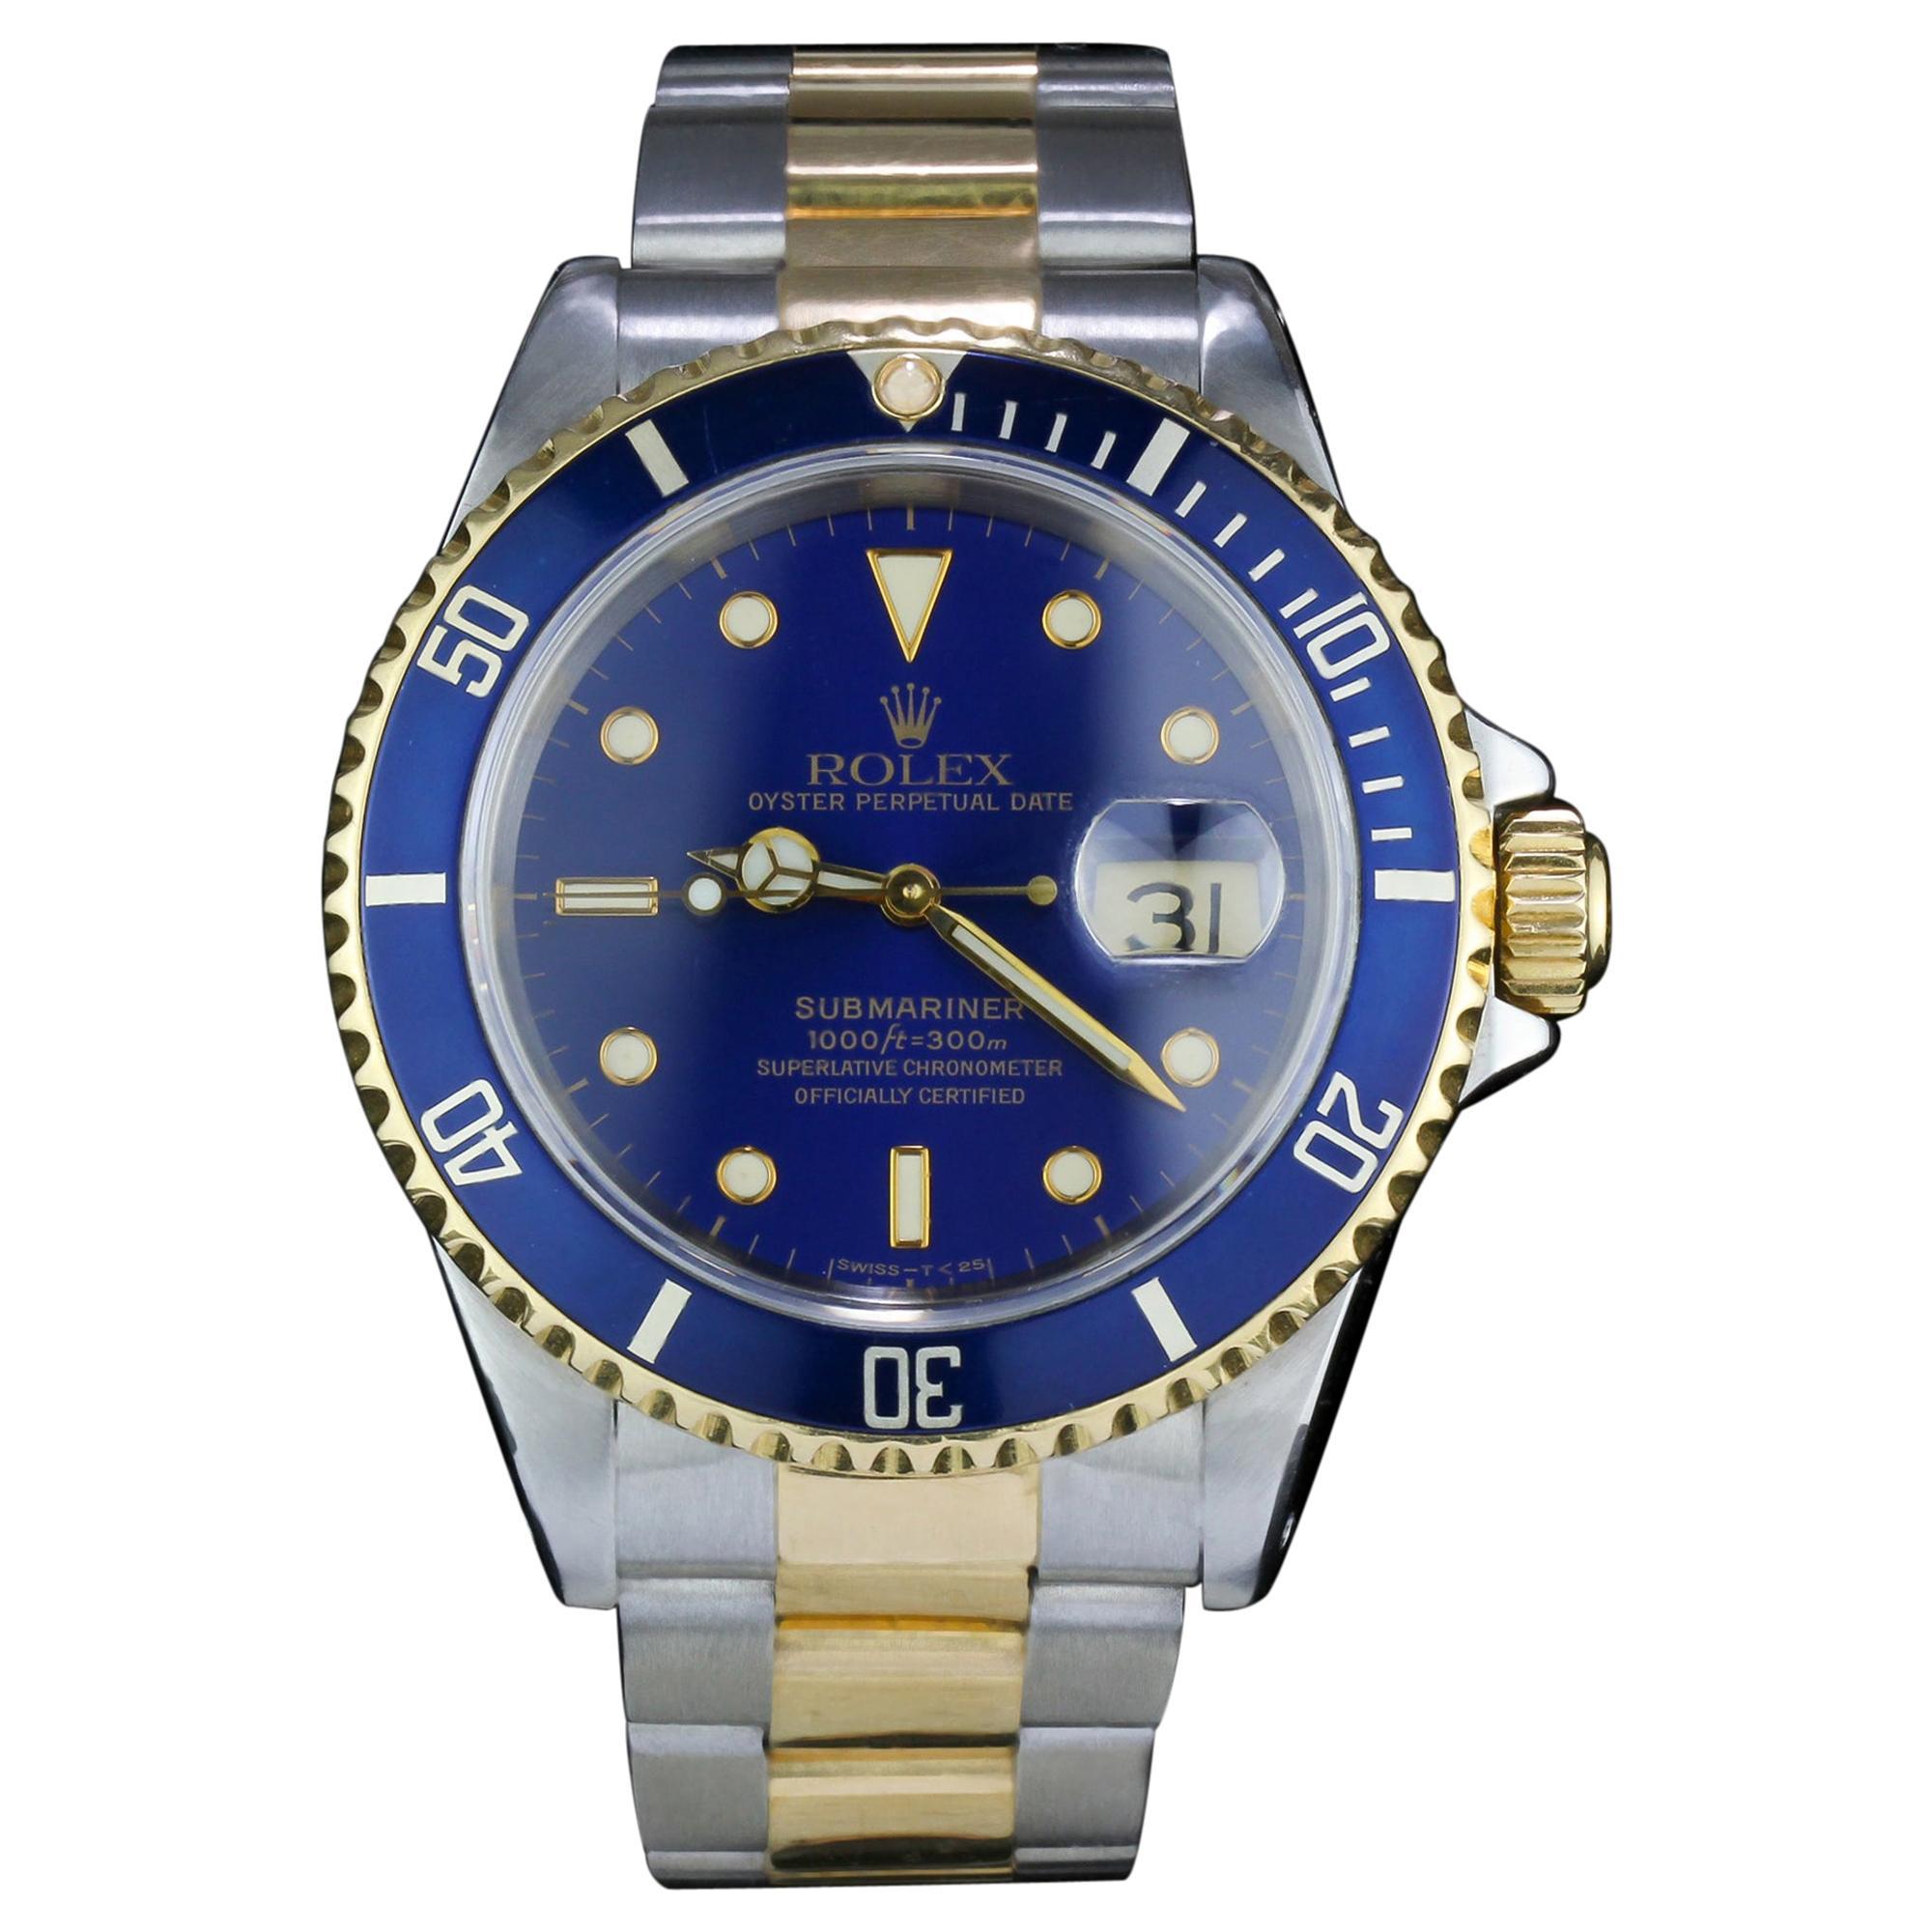 Rolex Submariner Date Ref 16613